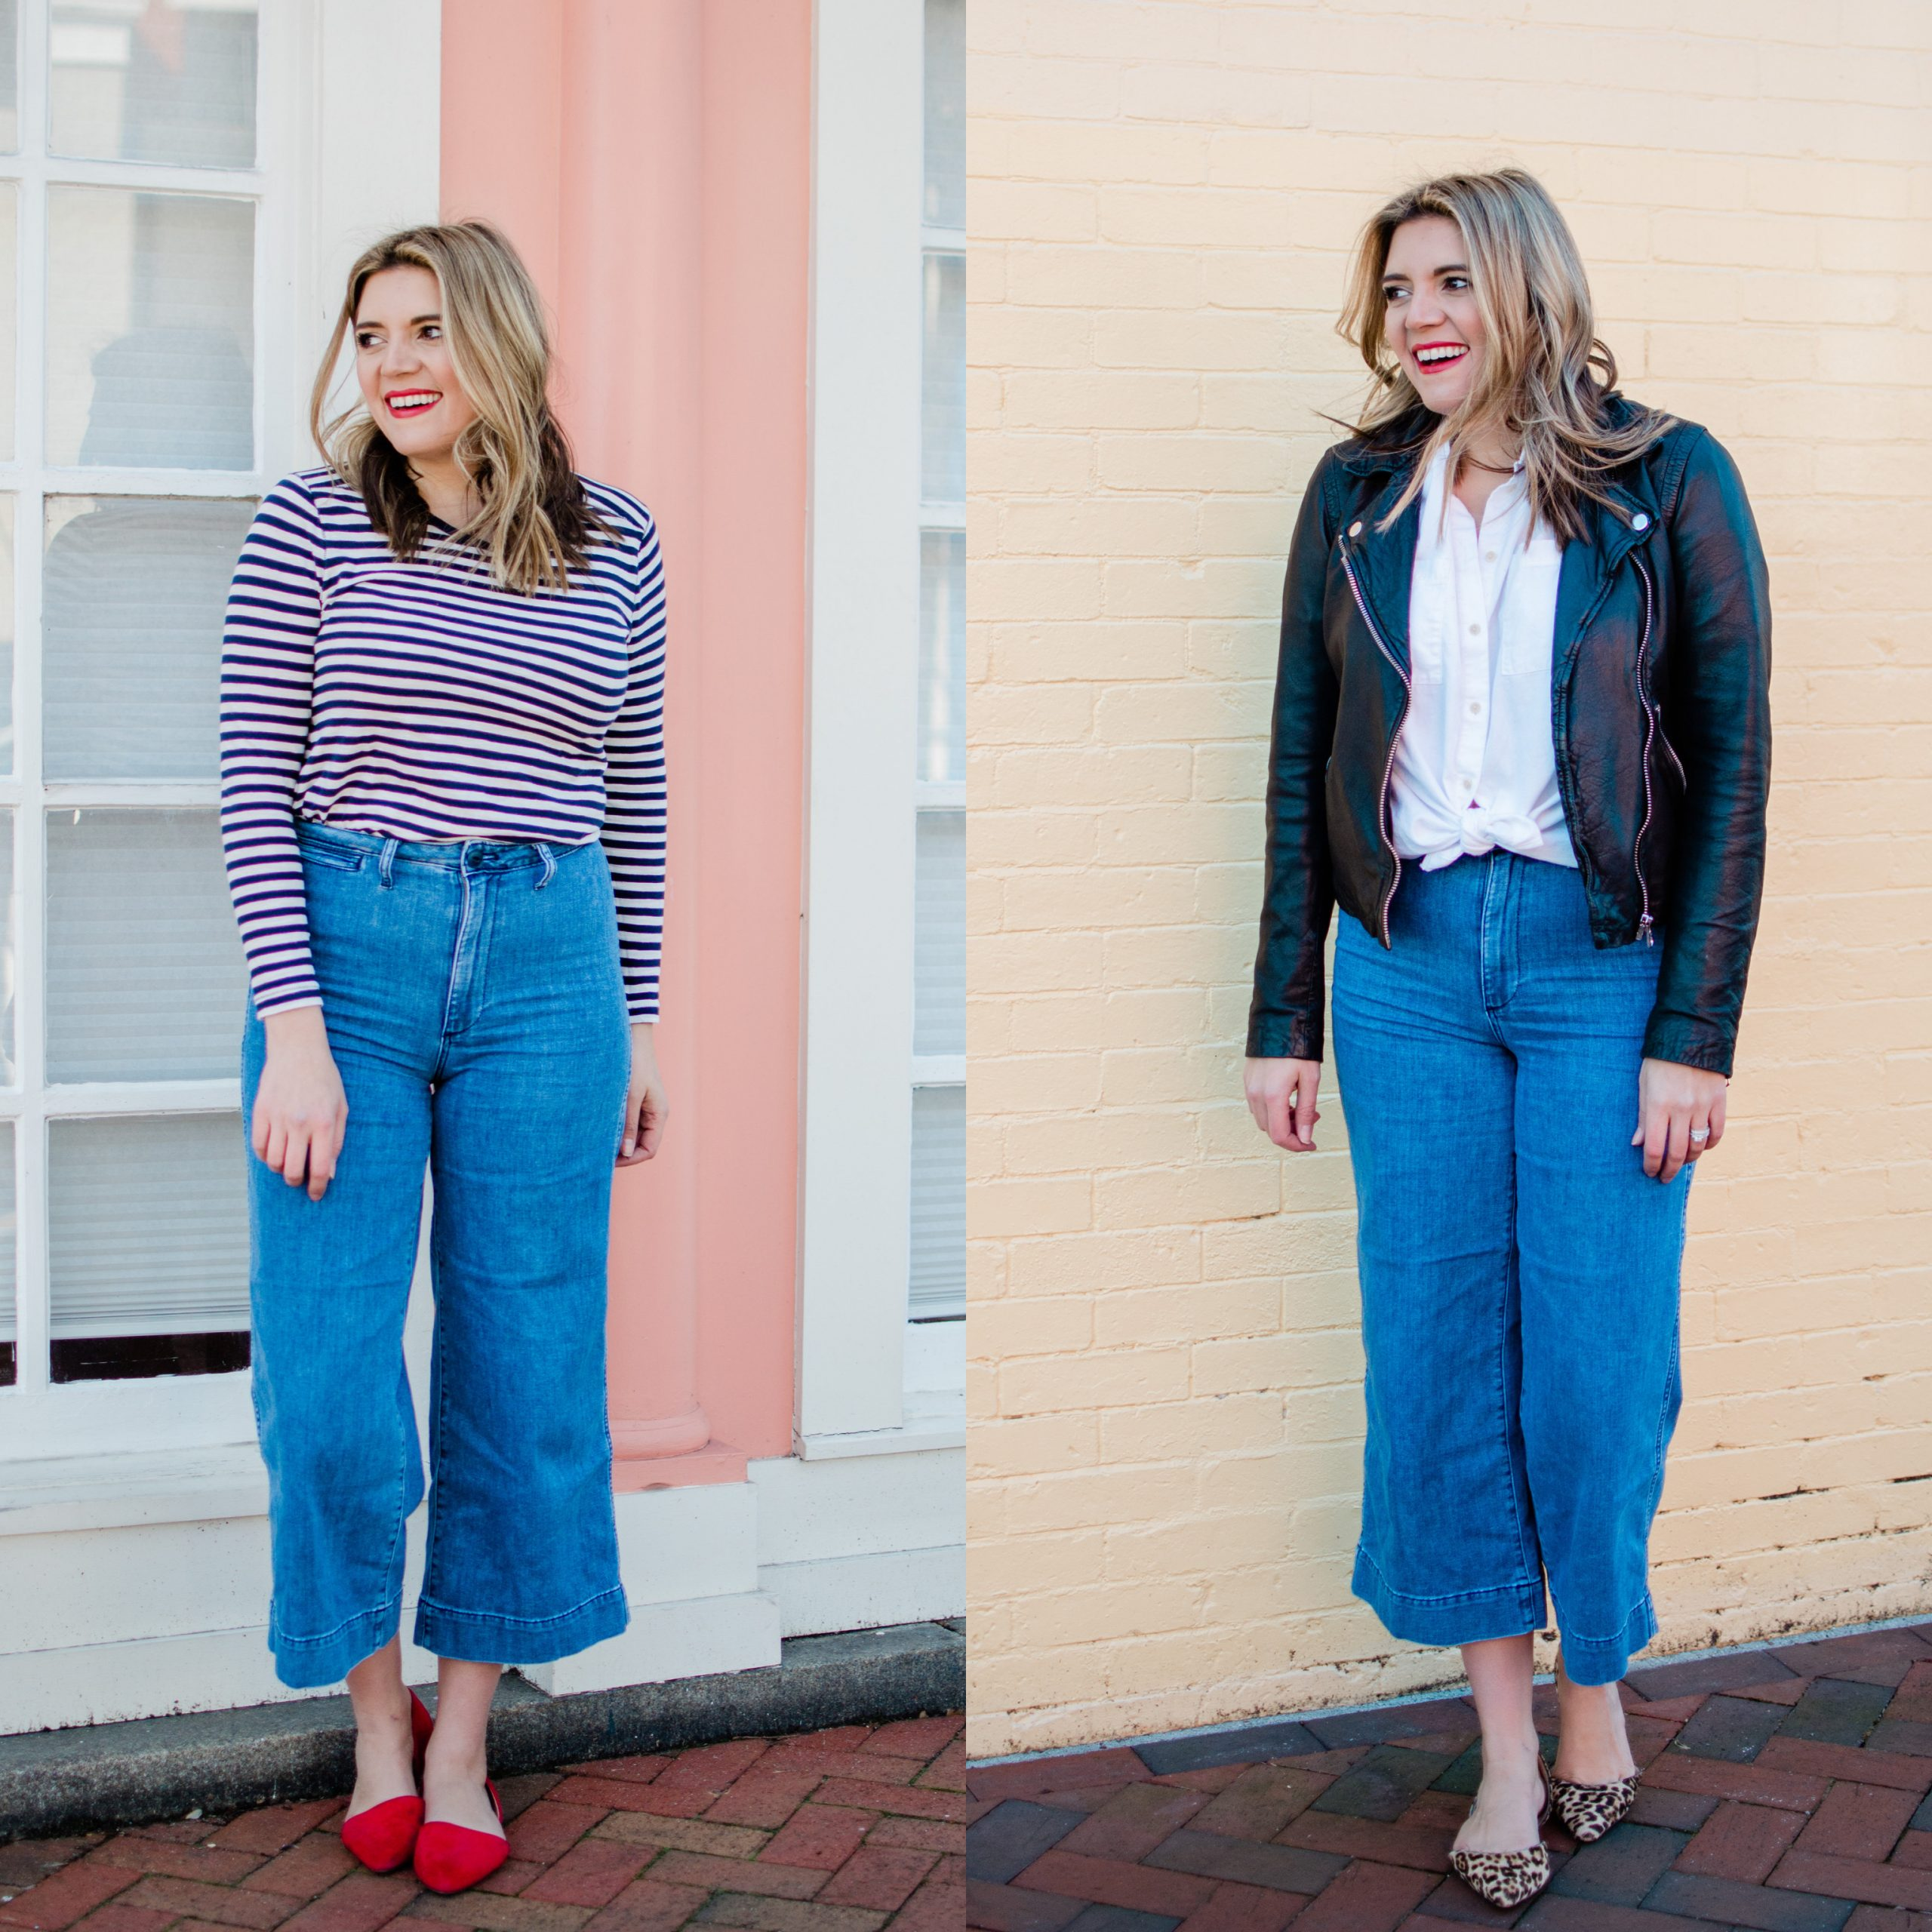 RVA blogger, Lauren Dix, shares all the best Instagram Spots in Richmond, VA! One of the best RVA photo spots is Main Street in the fan!